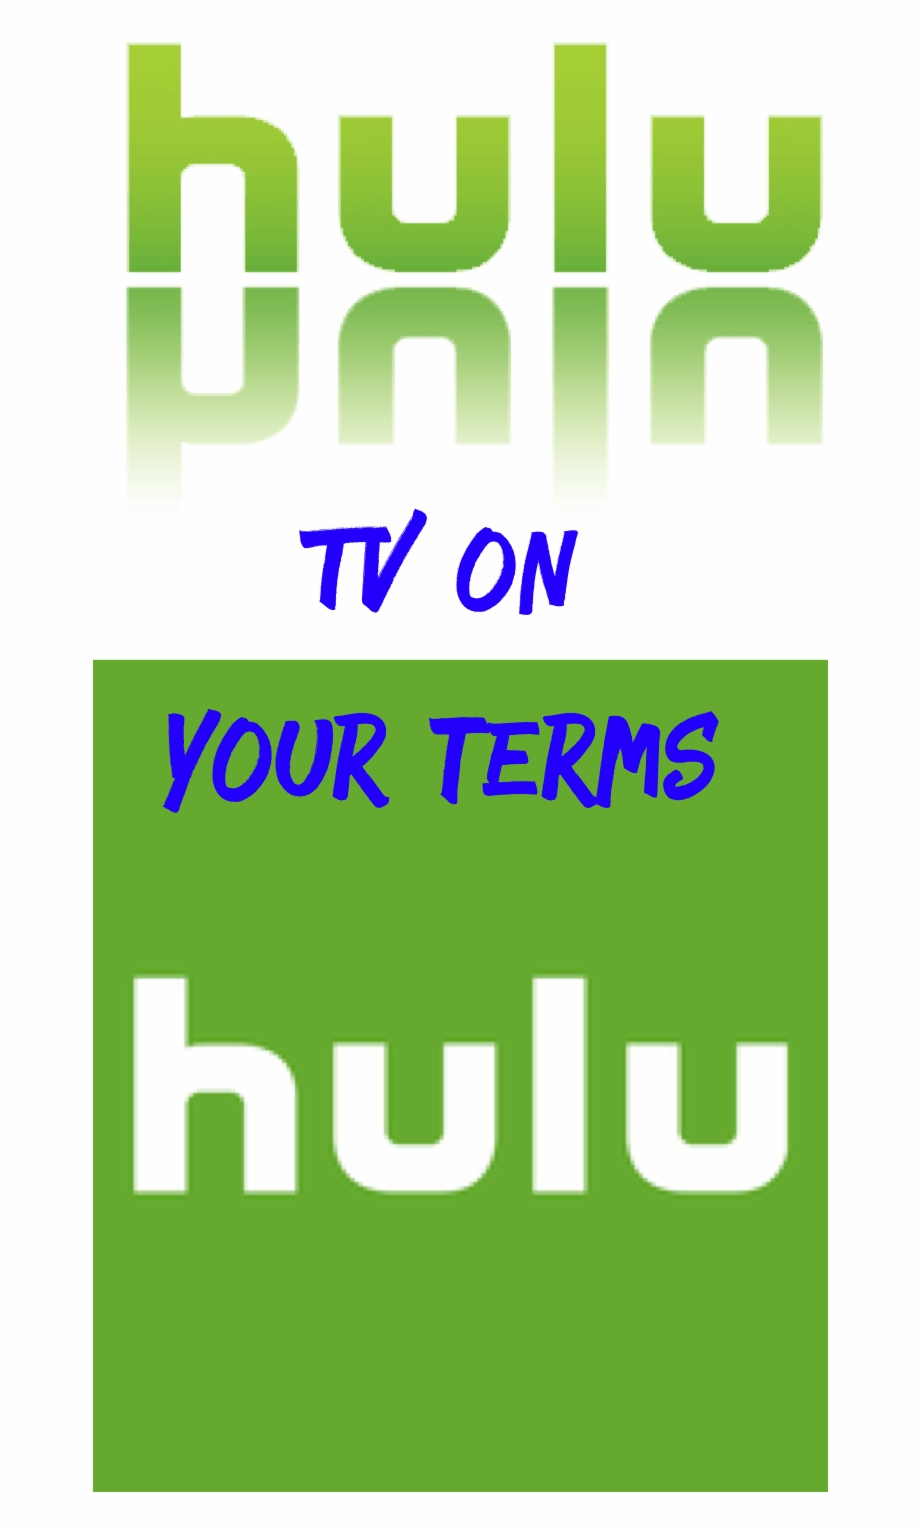 Hulu App Logo Png - Hulu | Transparent PNG Download #1936226 - Vippng